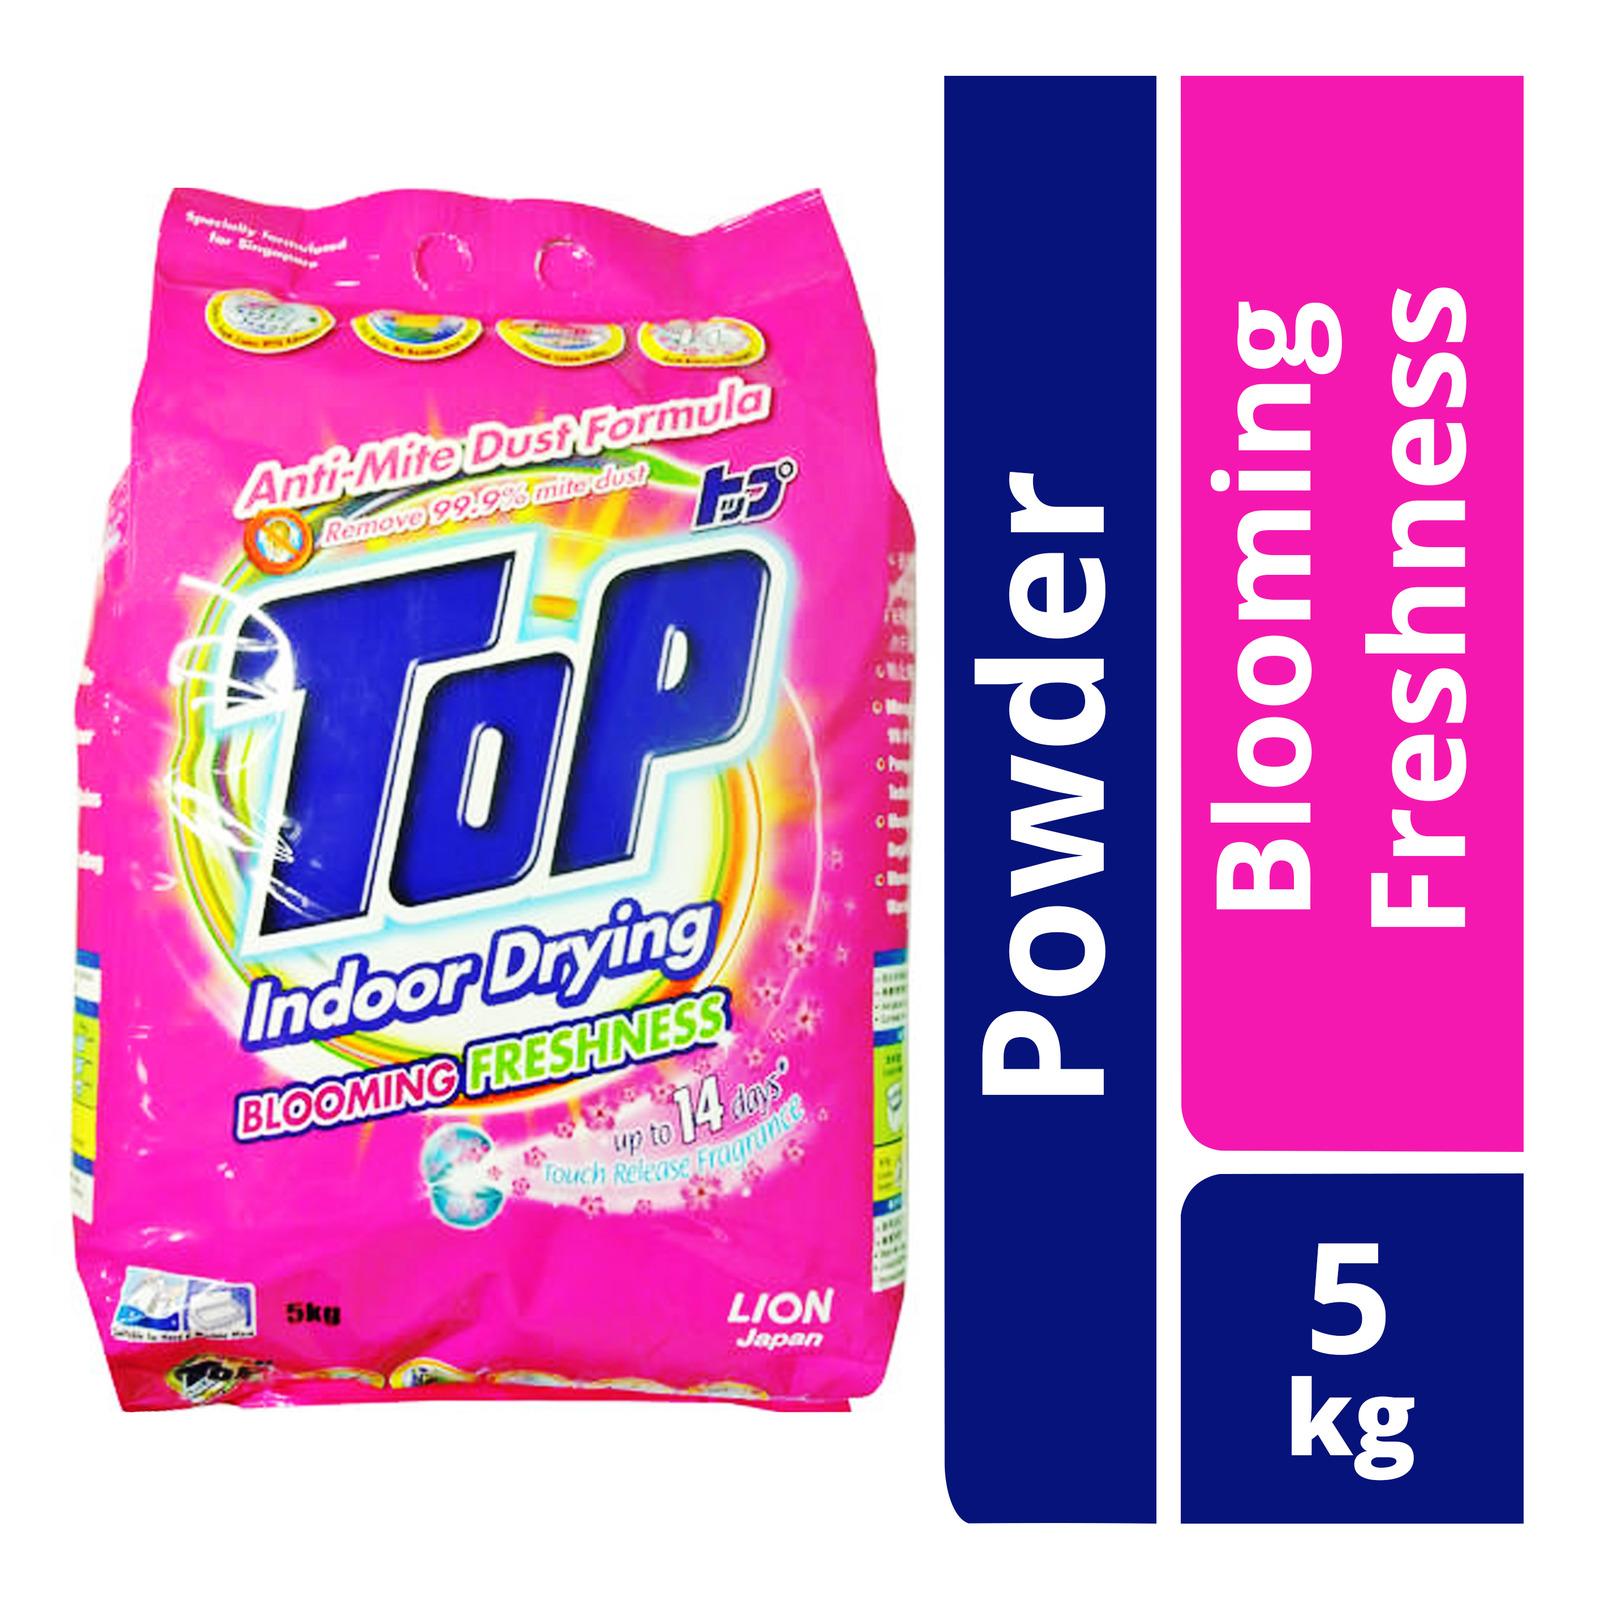 Top Indoor Drying Washing Powder - Blooming Freshness